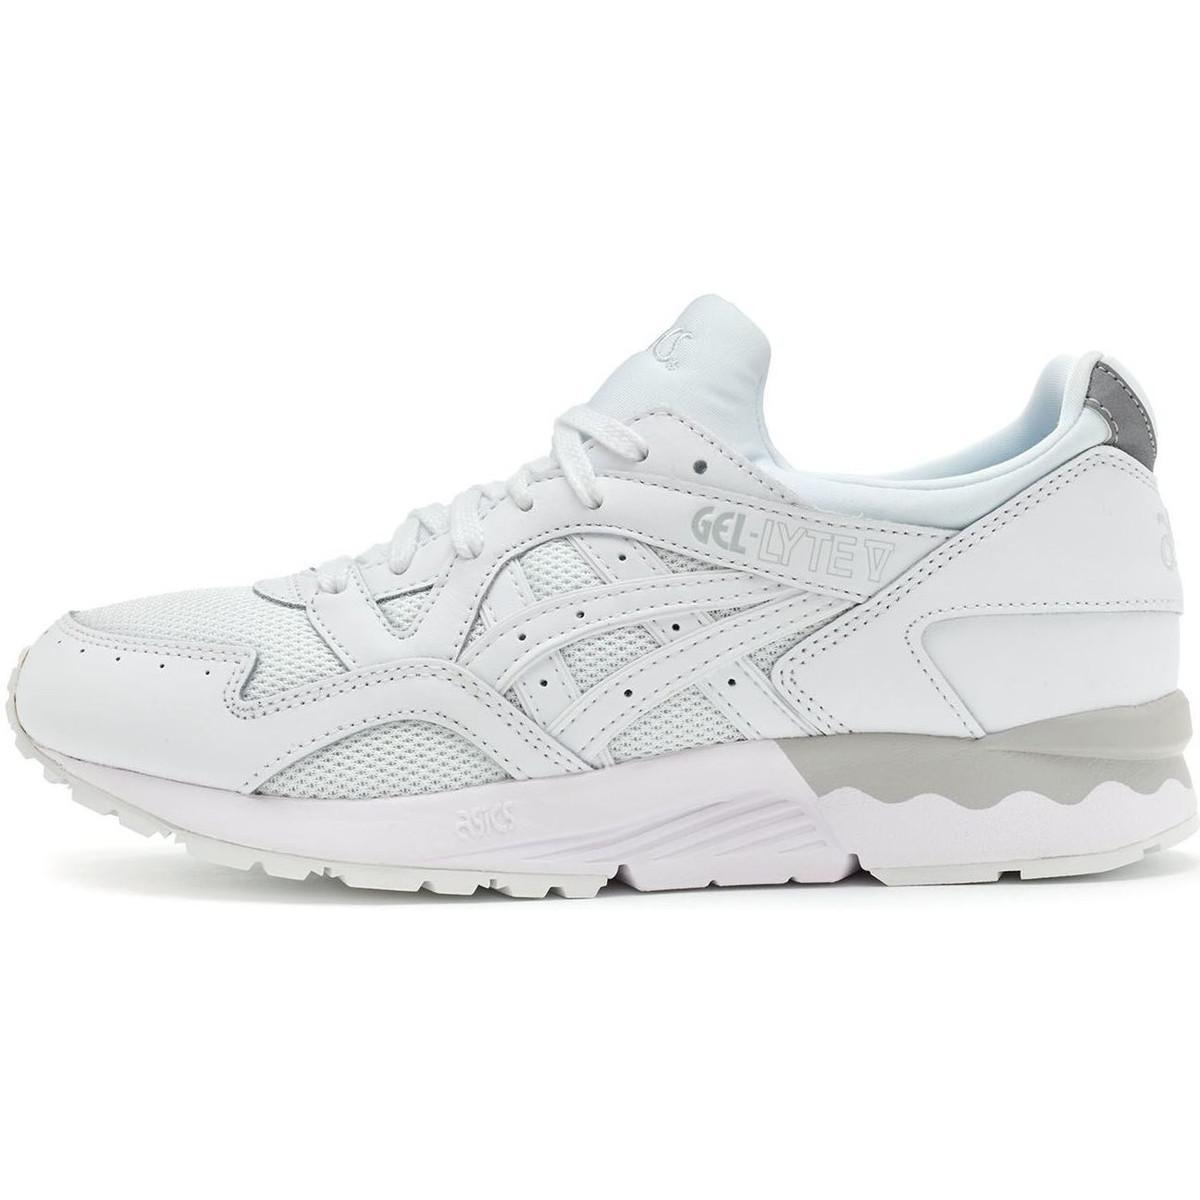 finest selection 418f0 e096e Asics Gel Lyte V Trainers In White Hl6g3 0101 Women's Shoes ...